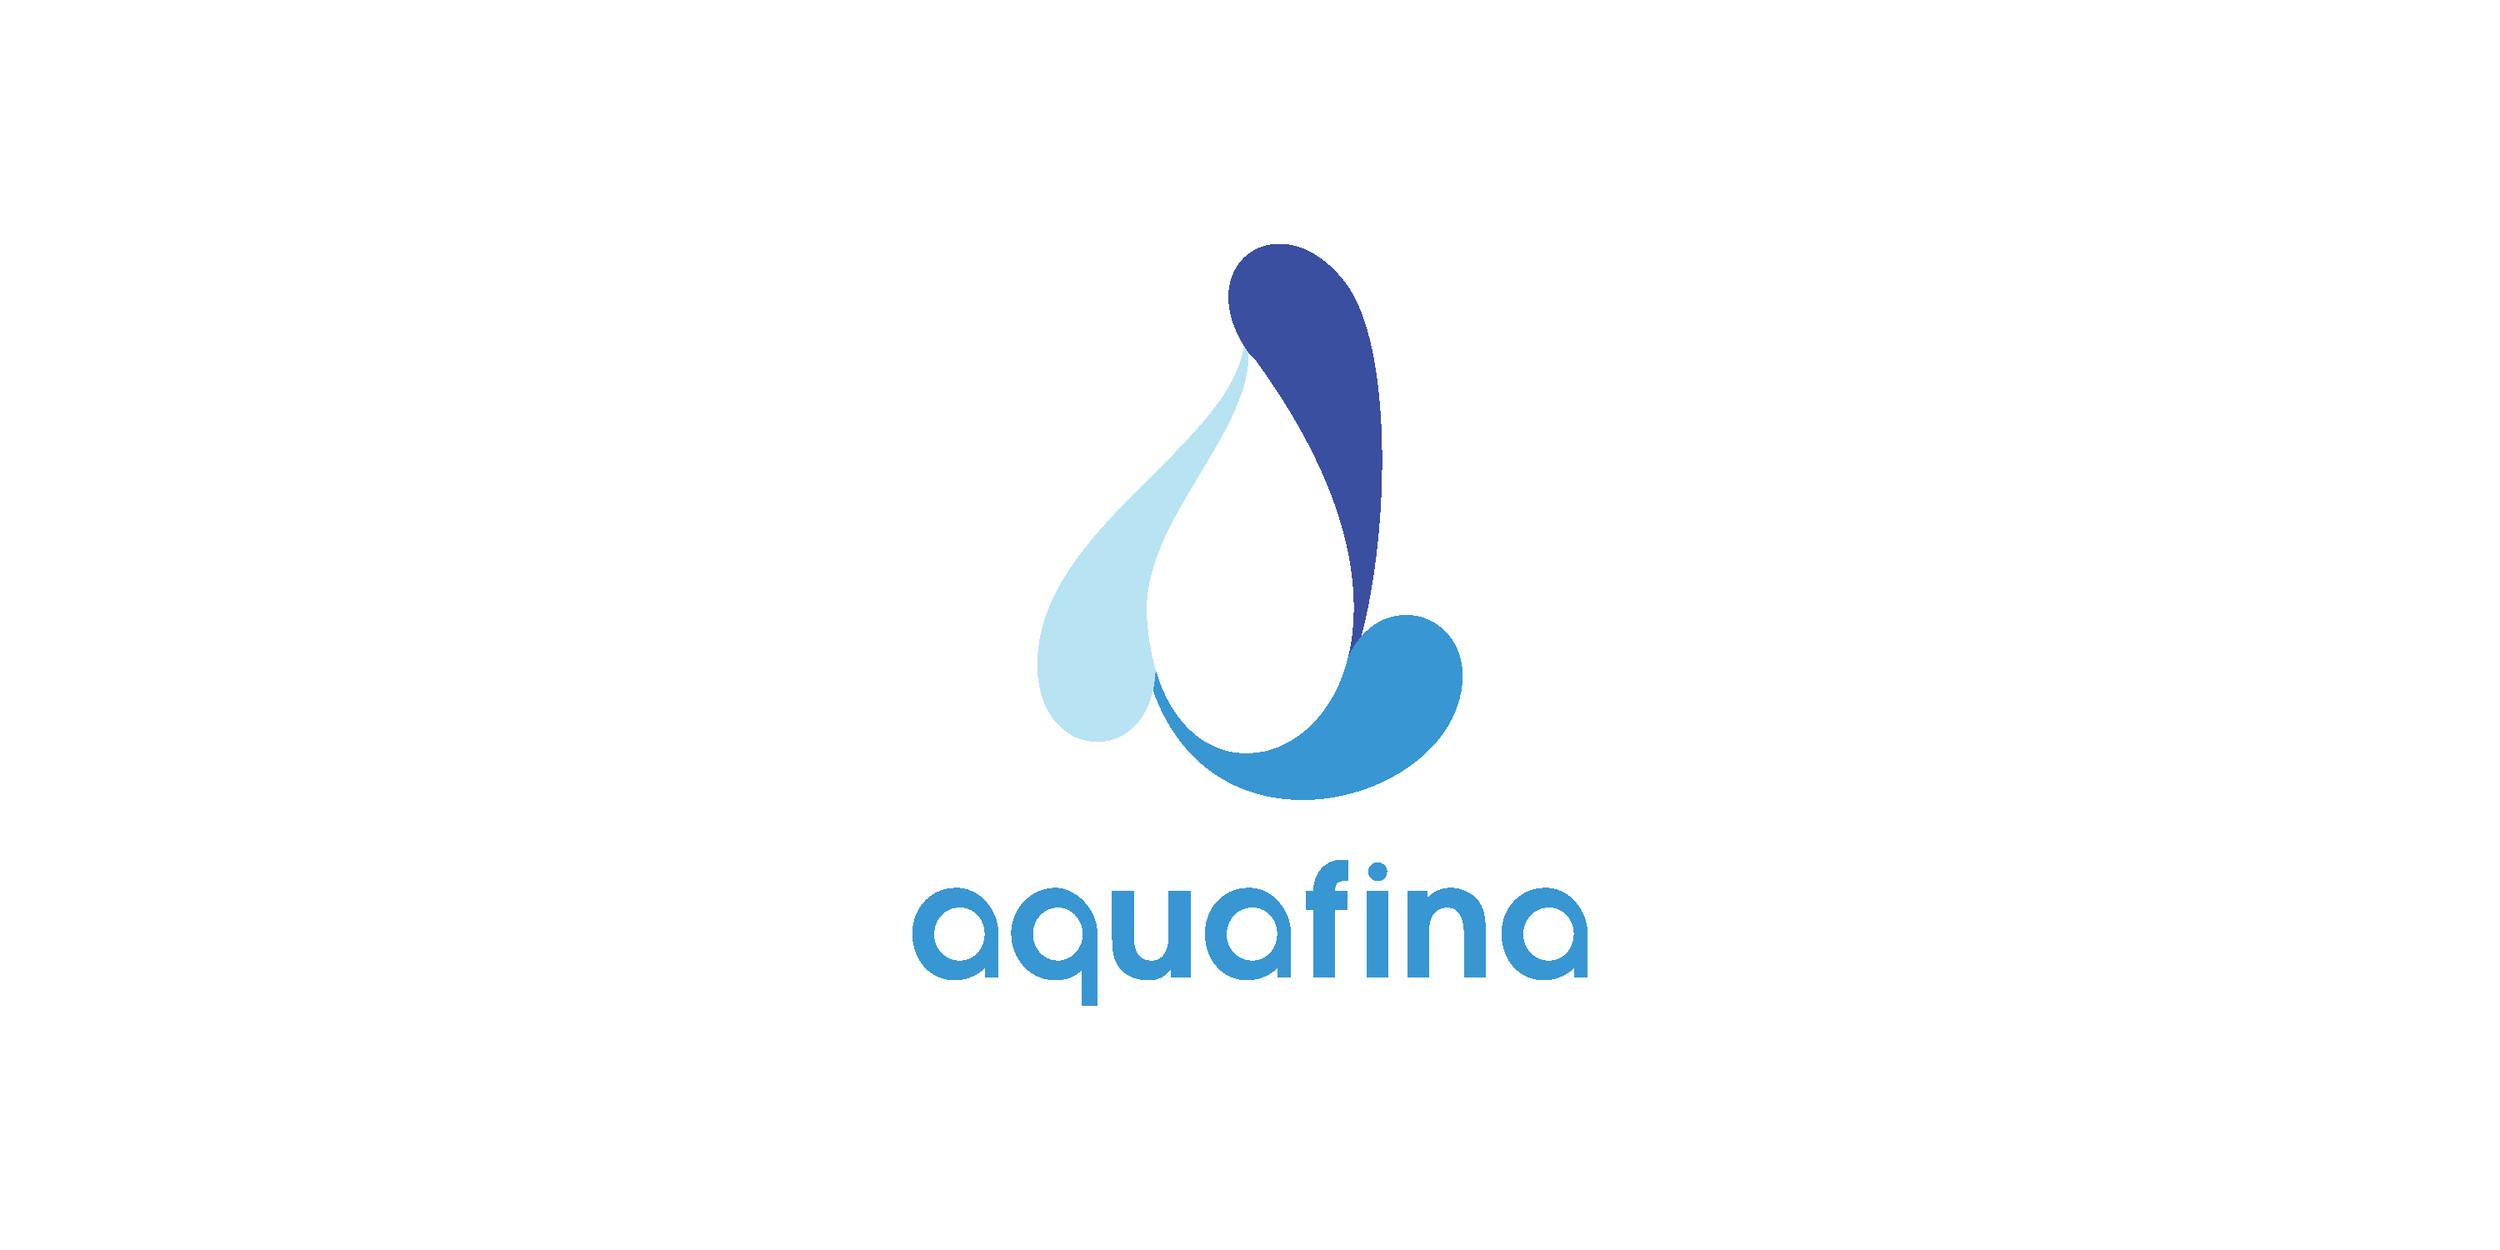 aquafina-03.jpg